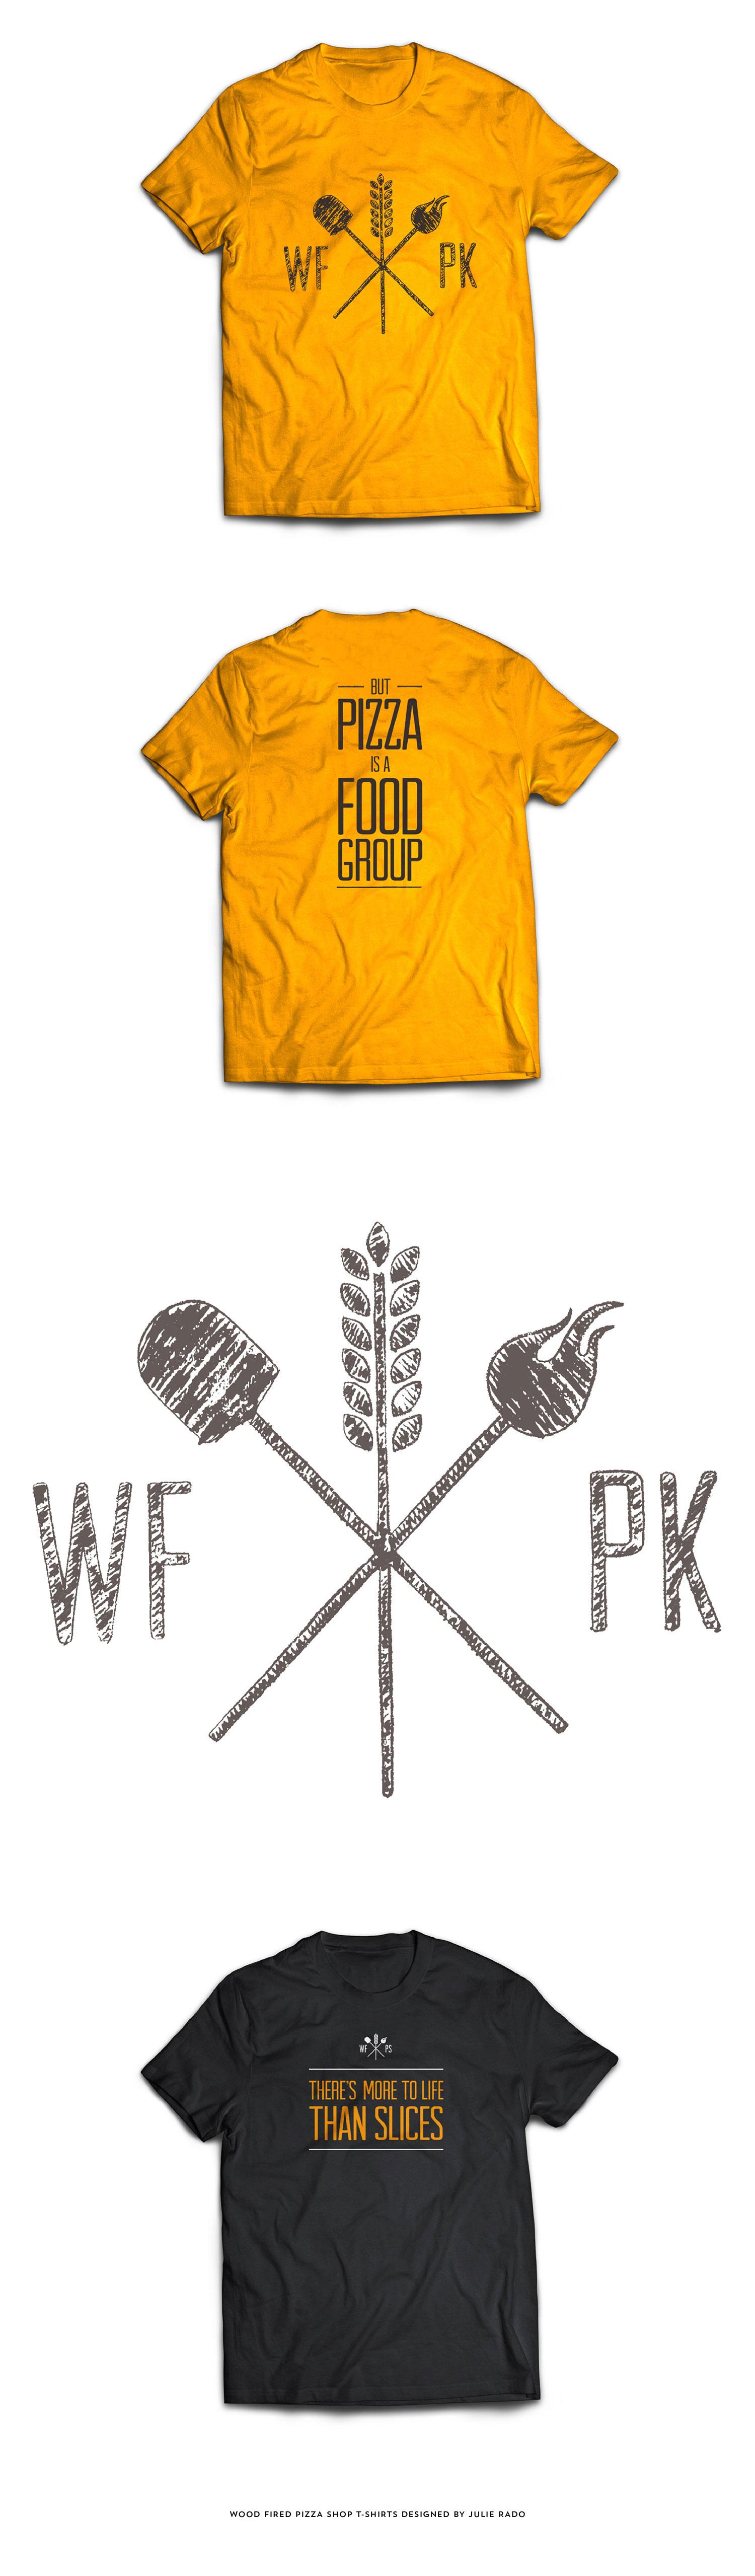 Wood Fired Pizza Shop T-Shirts designed by Julie Rado